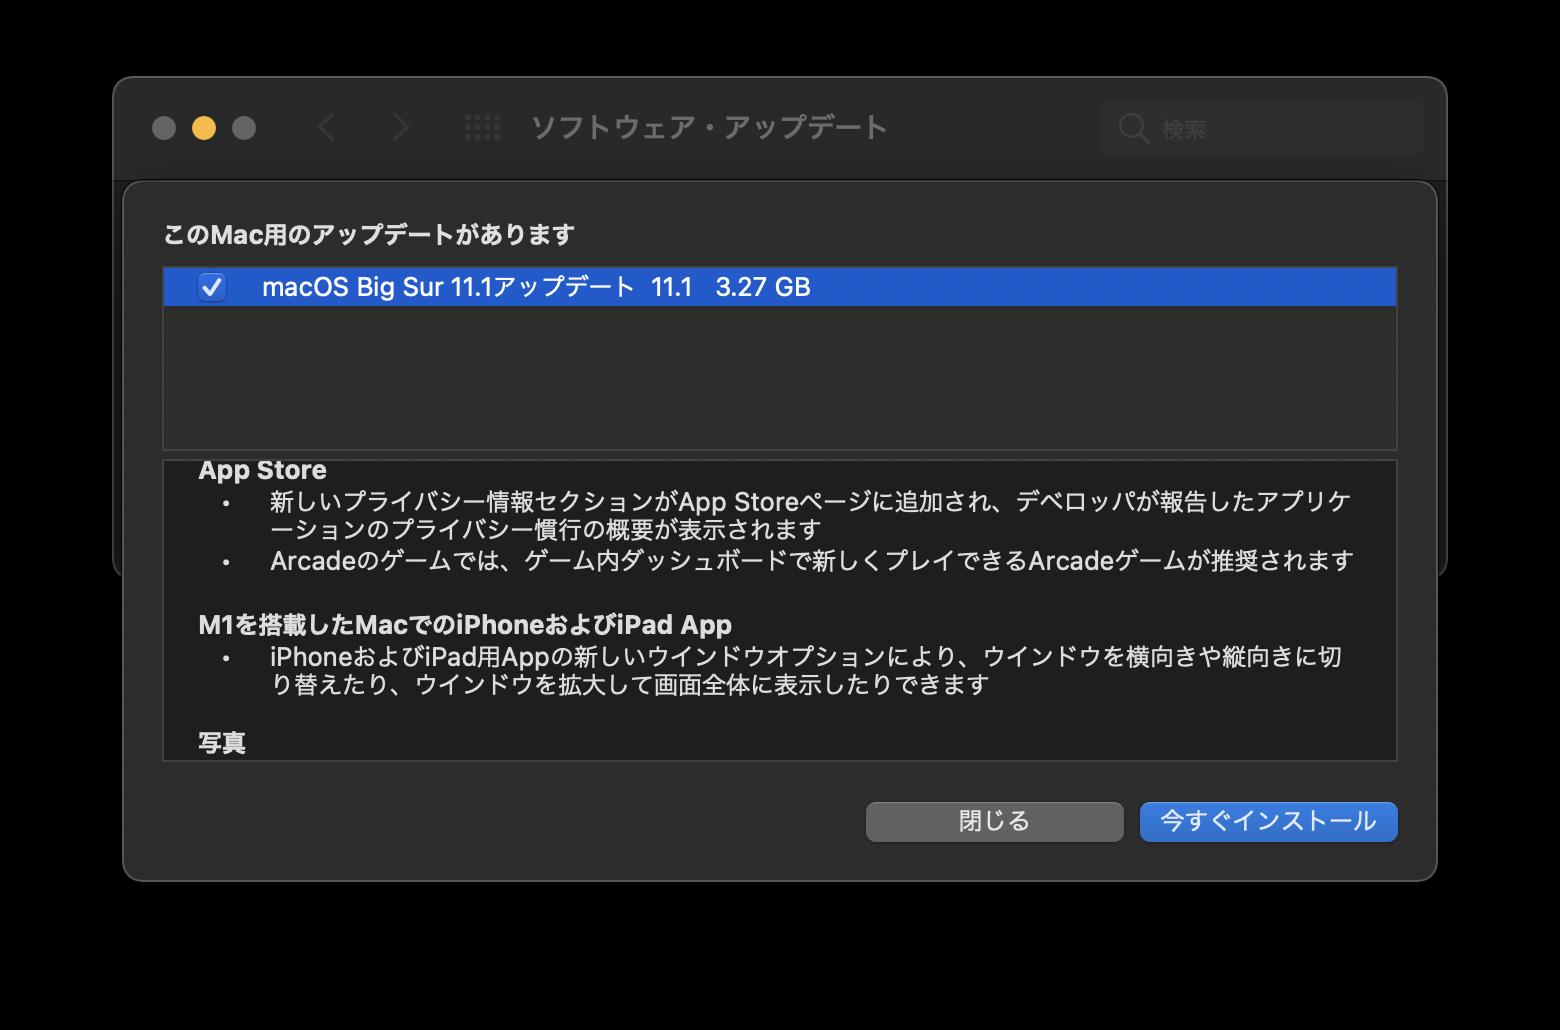 M1 MacでiPhoneとiPadのアプリを拡大可能に 「macOS Big Sur 11.1」で AirPods Max対応も - ITmedia NEWS